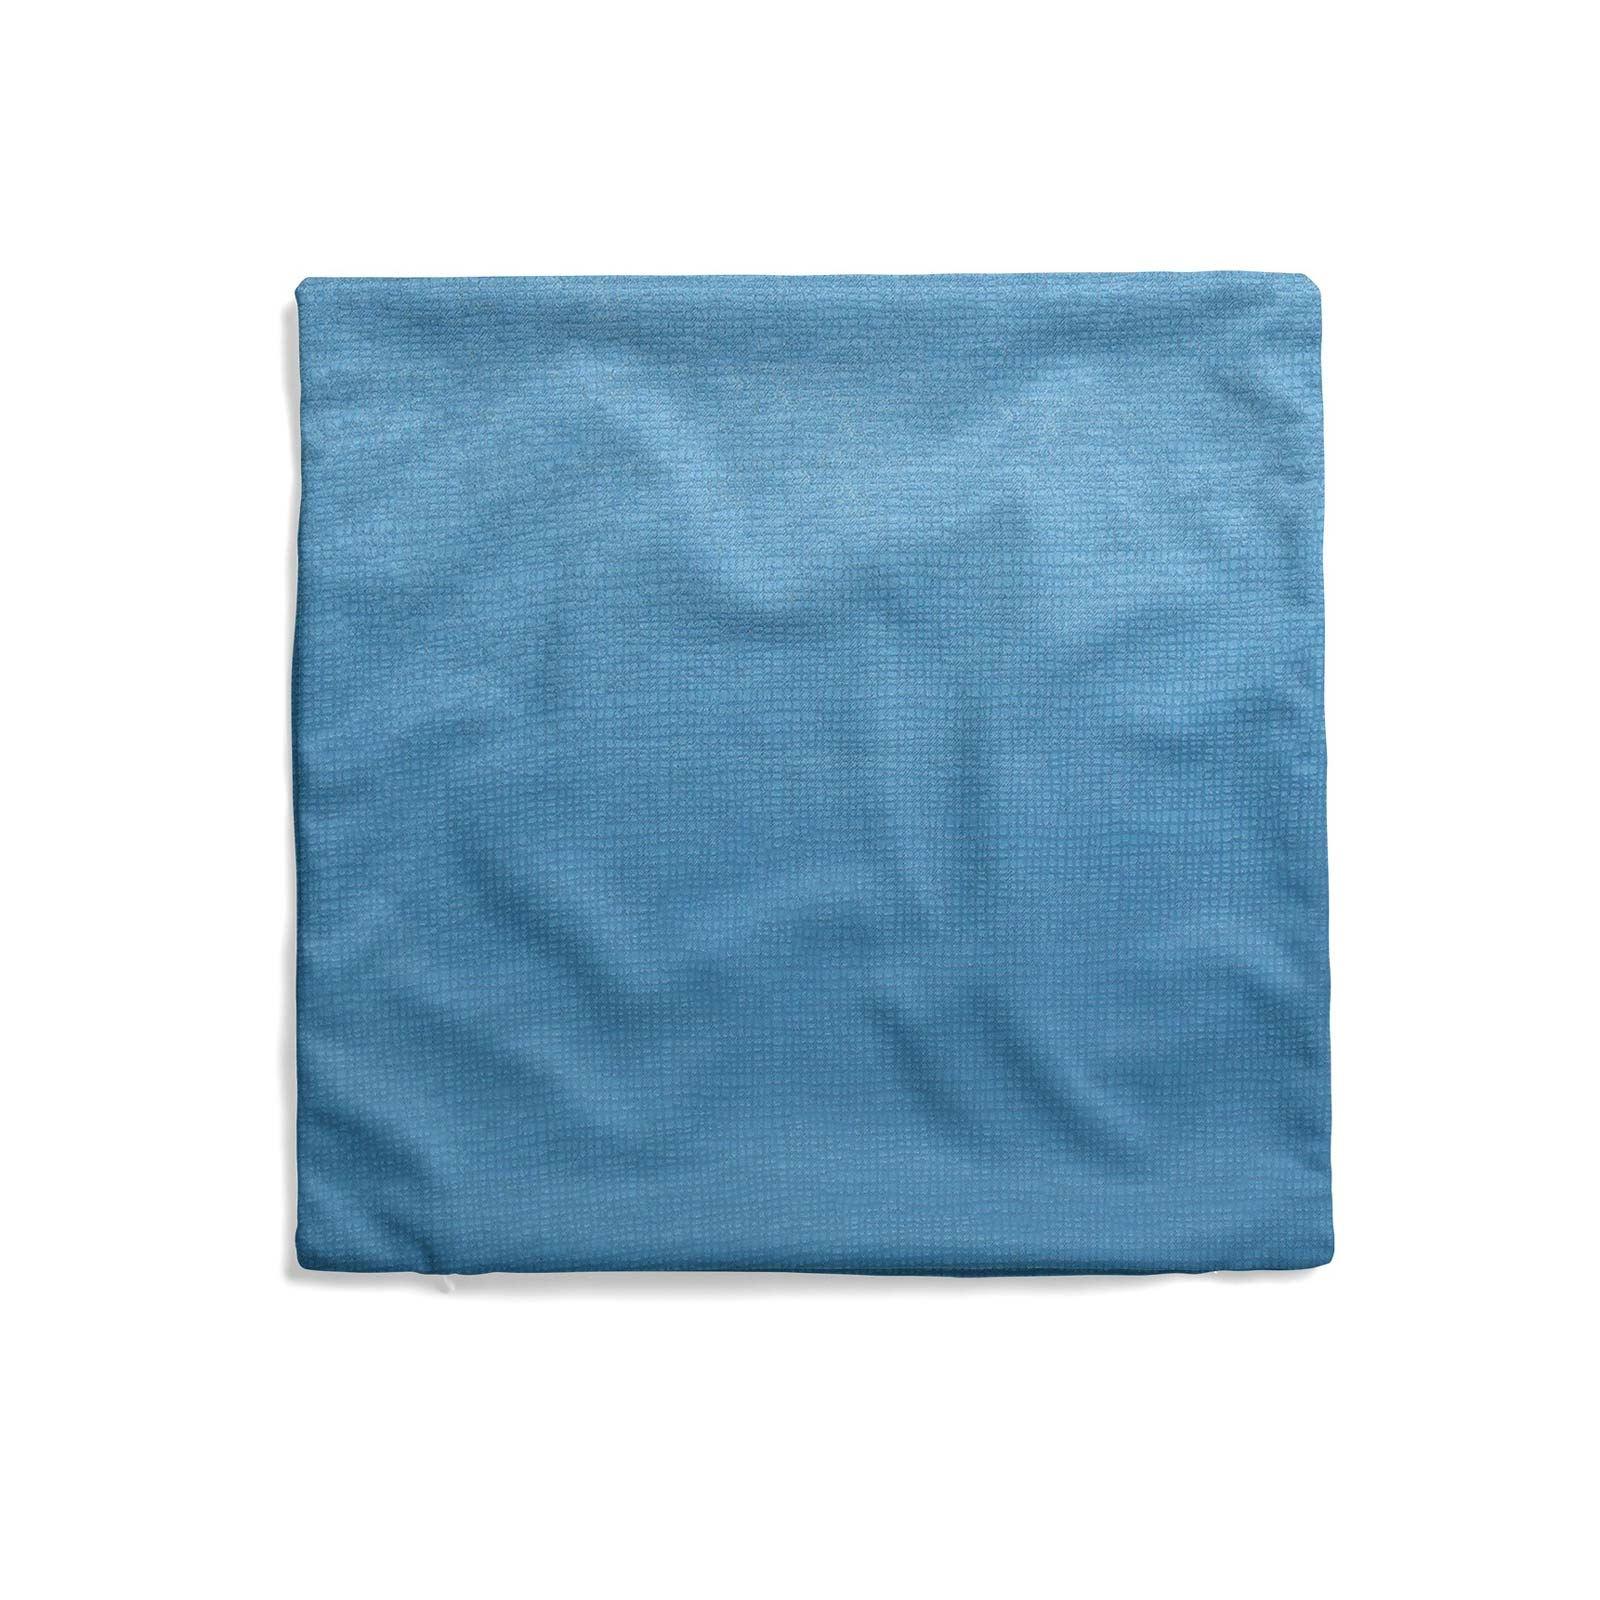 Teal-Blue-Duck-Egg-Cushion-Covers-18-034-x18-034-45cm-x-45cm-Luxury-Cover thumbnail 16